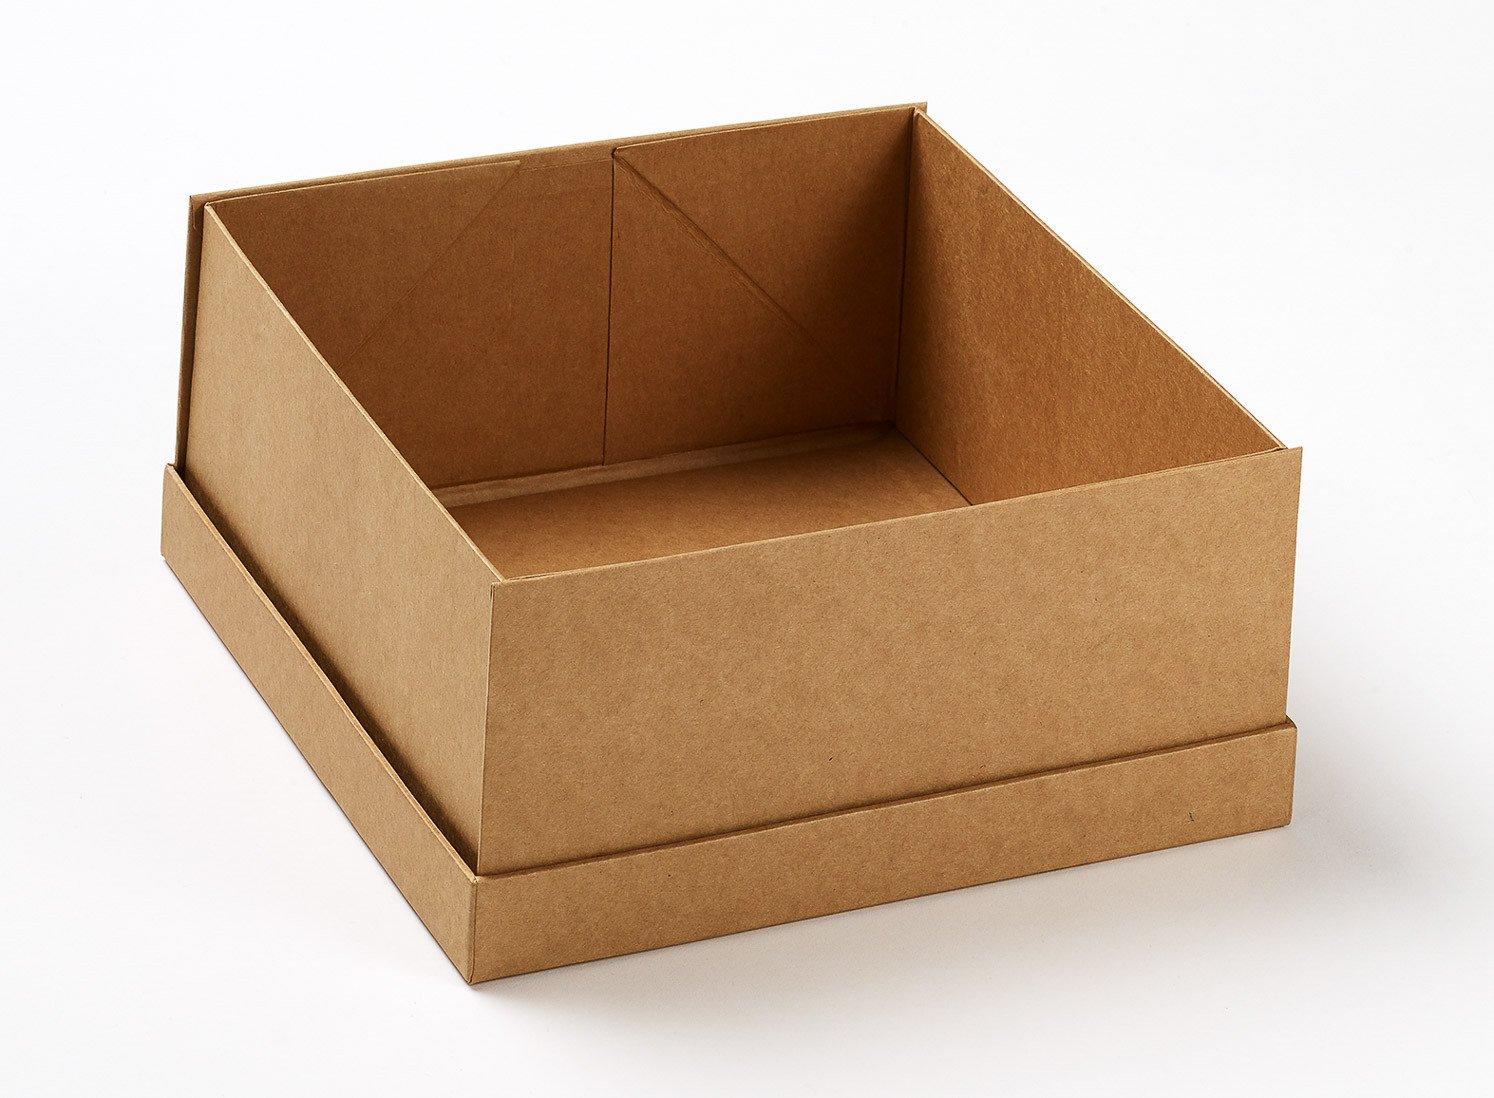 Serenity Spa Box